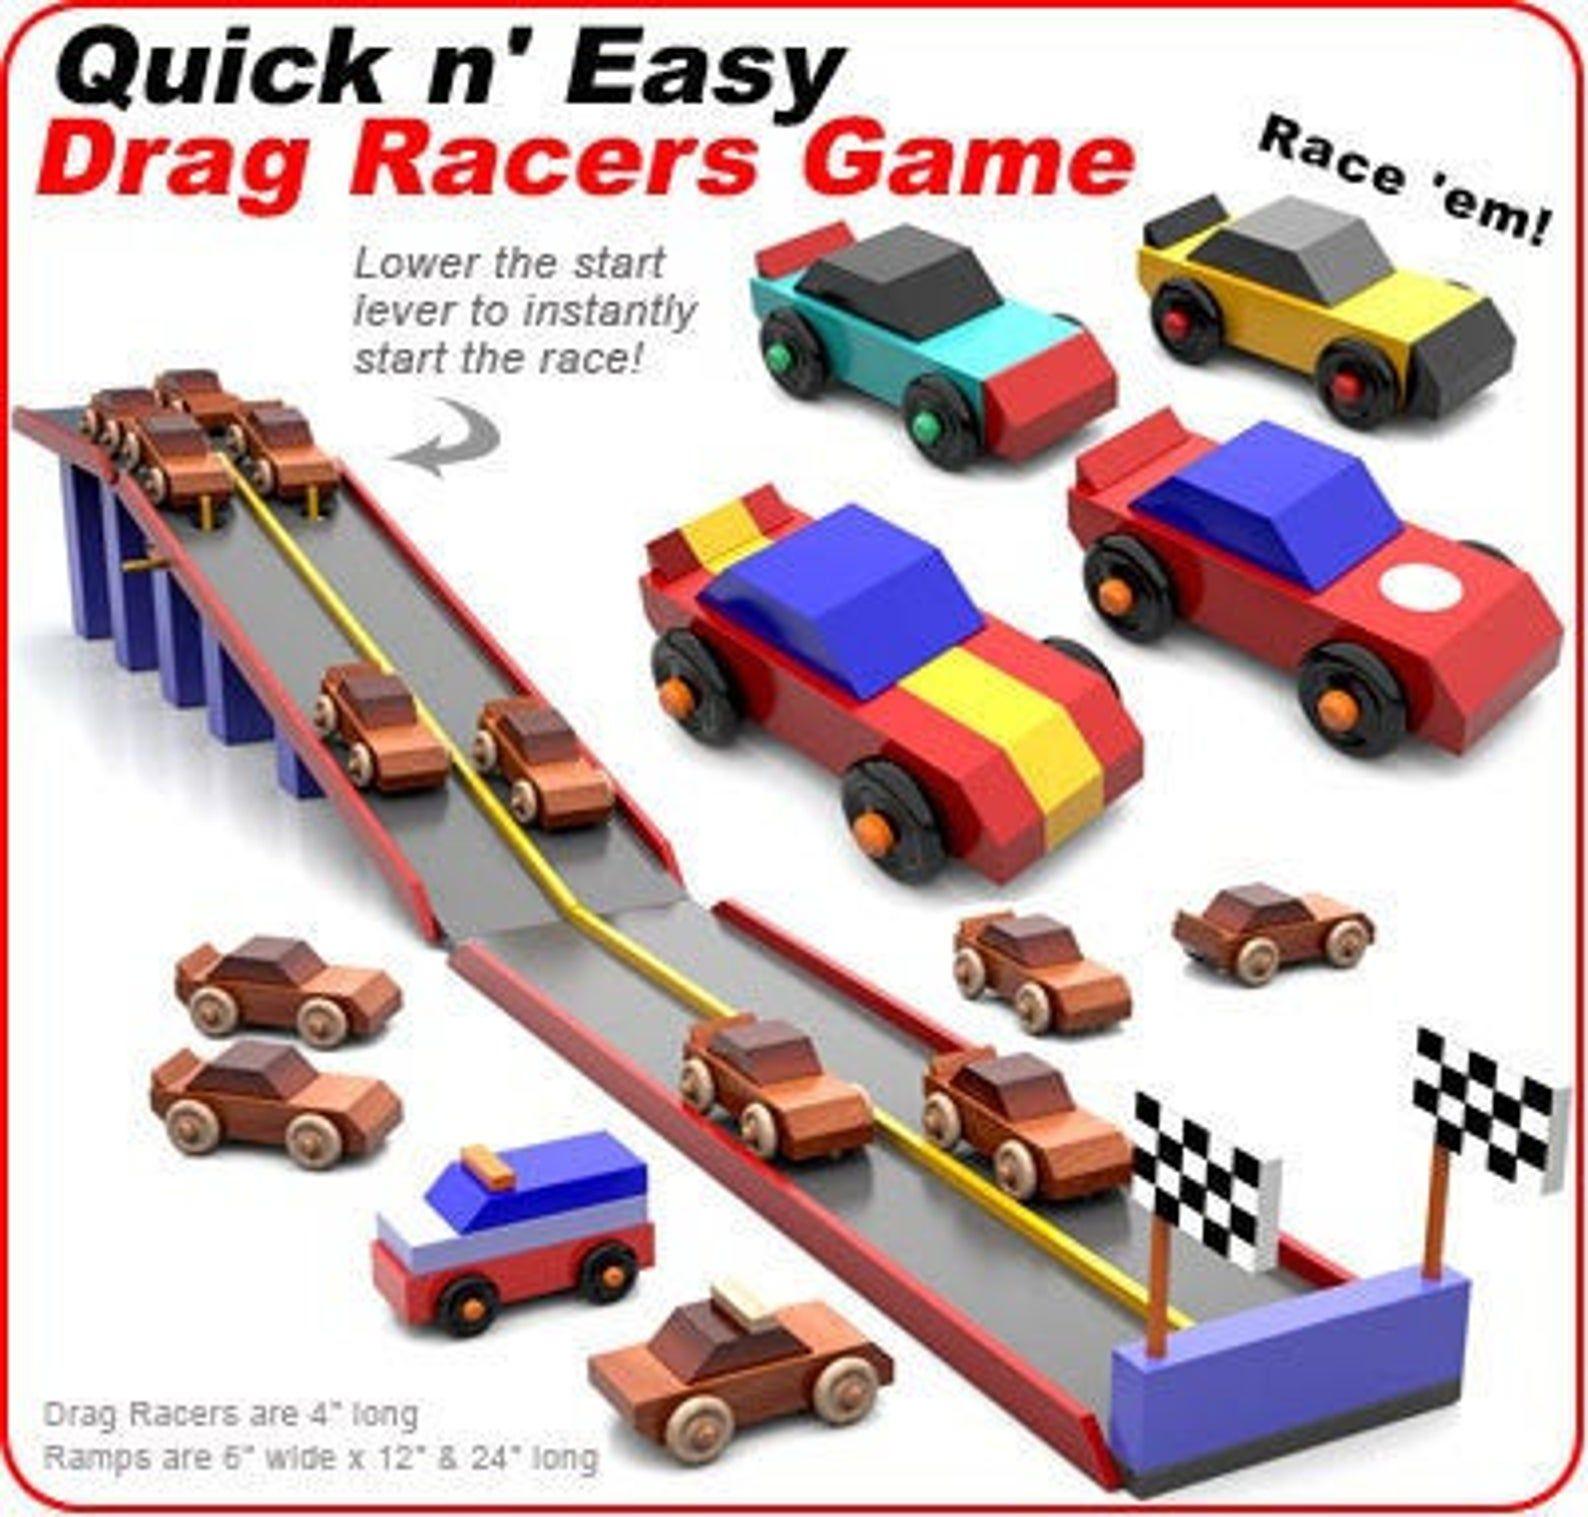 Quick n' Easy Drag Racers Game PDF Download Etsy in 2020